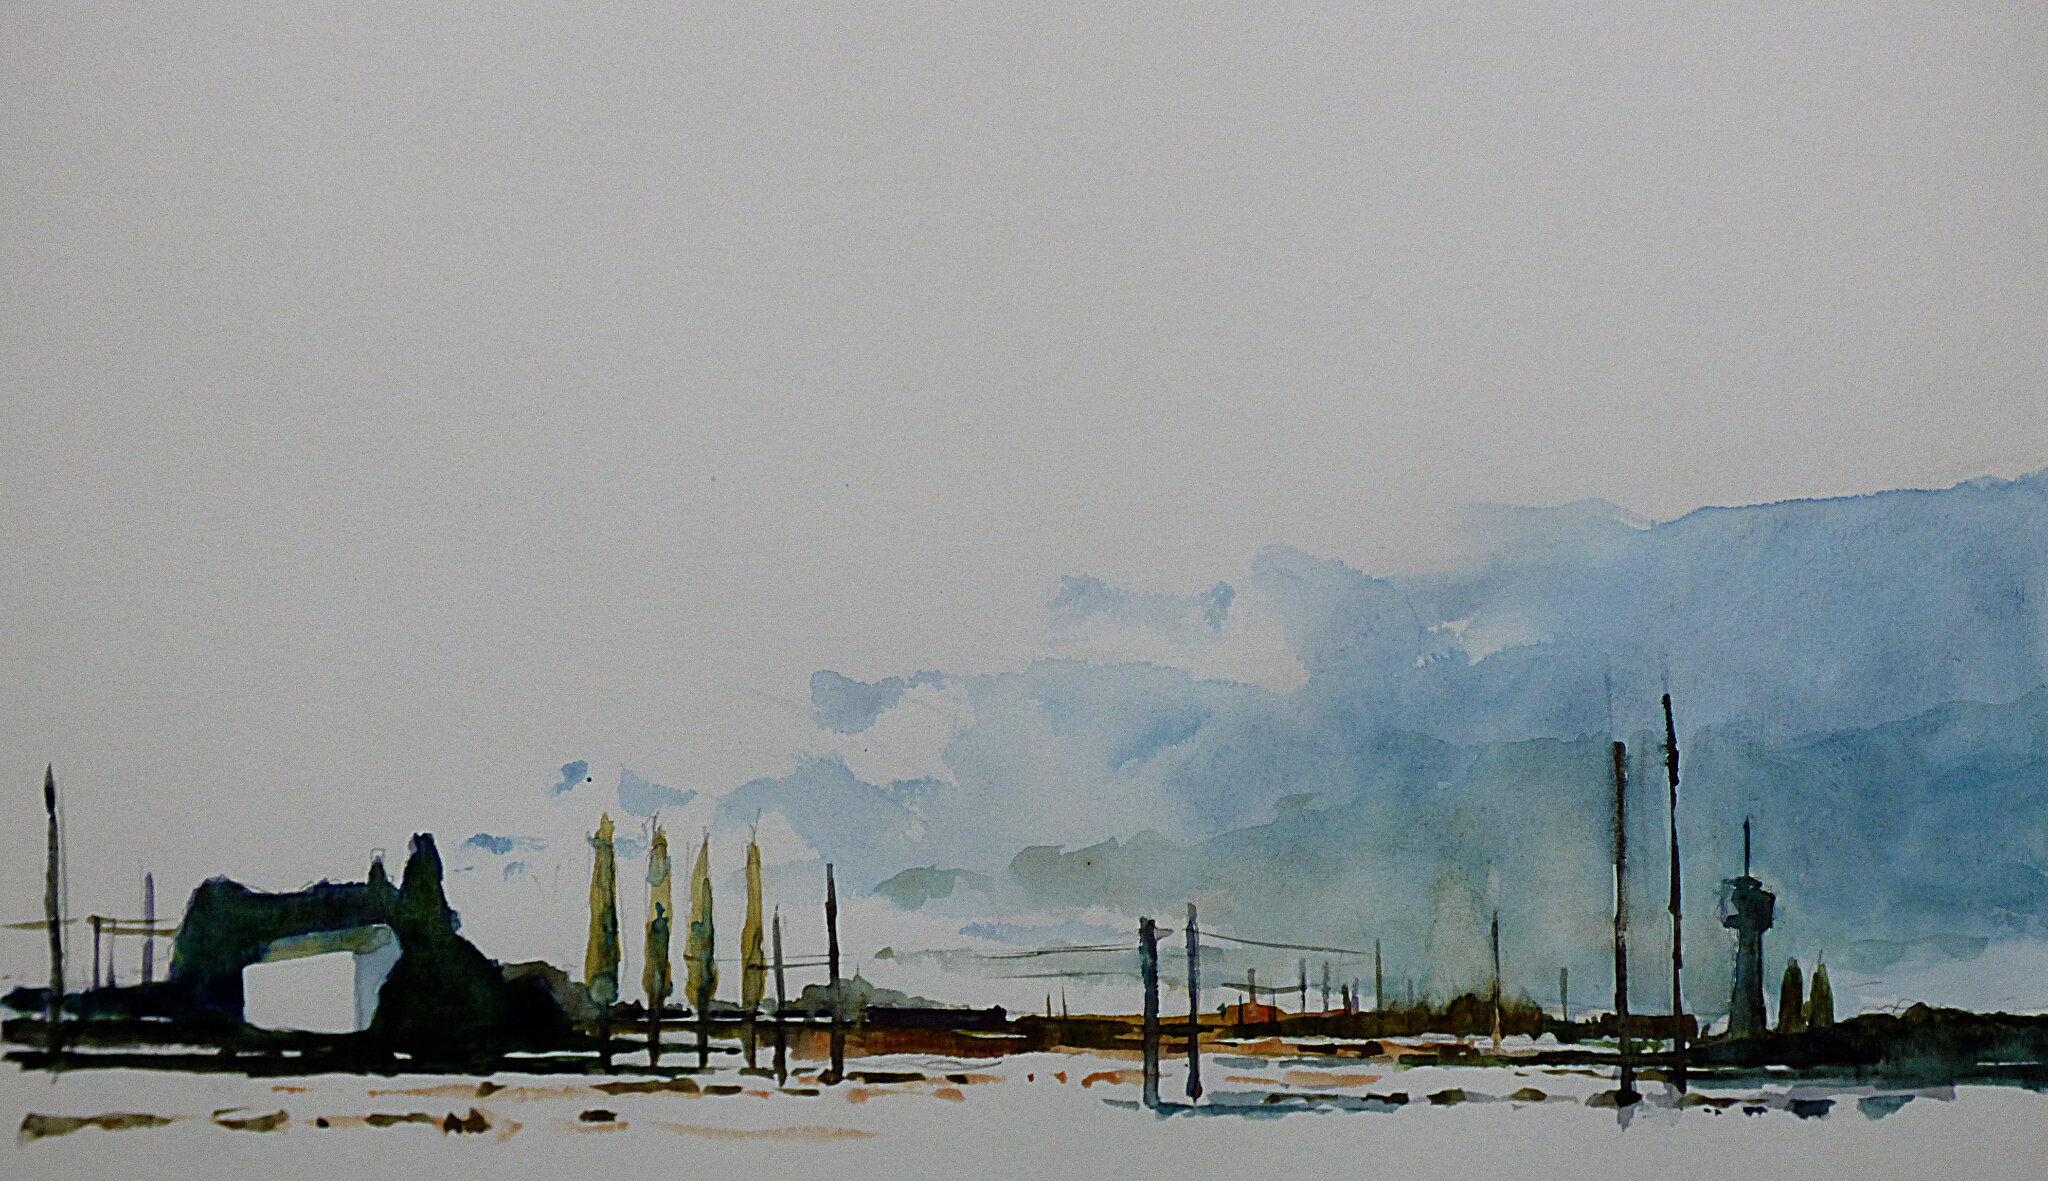 k nowhere 85, sept 2017, aquarelle, 41 x 25 cm